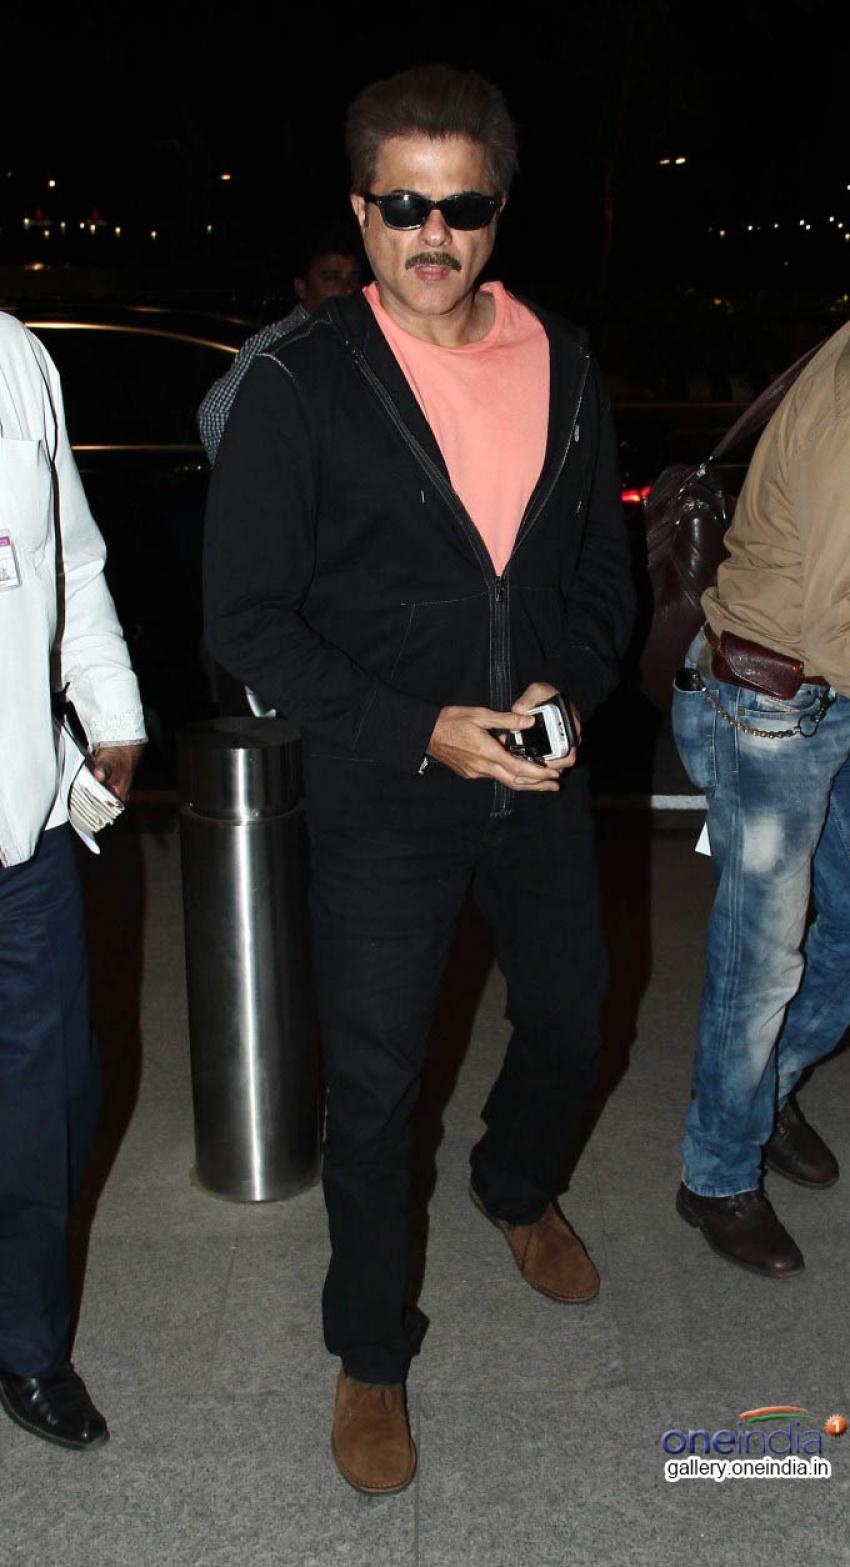 Anil Kapoor, Priyanka Chopra & Ranvir Singh Leaves to Cannes 2014 Photos